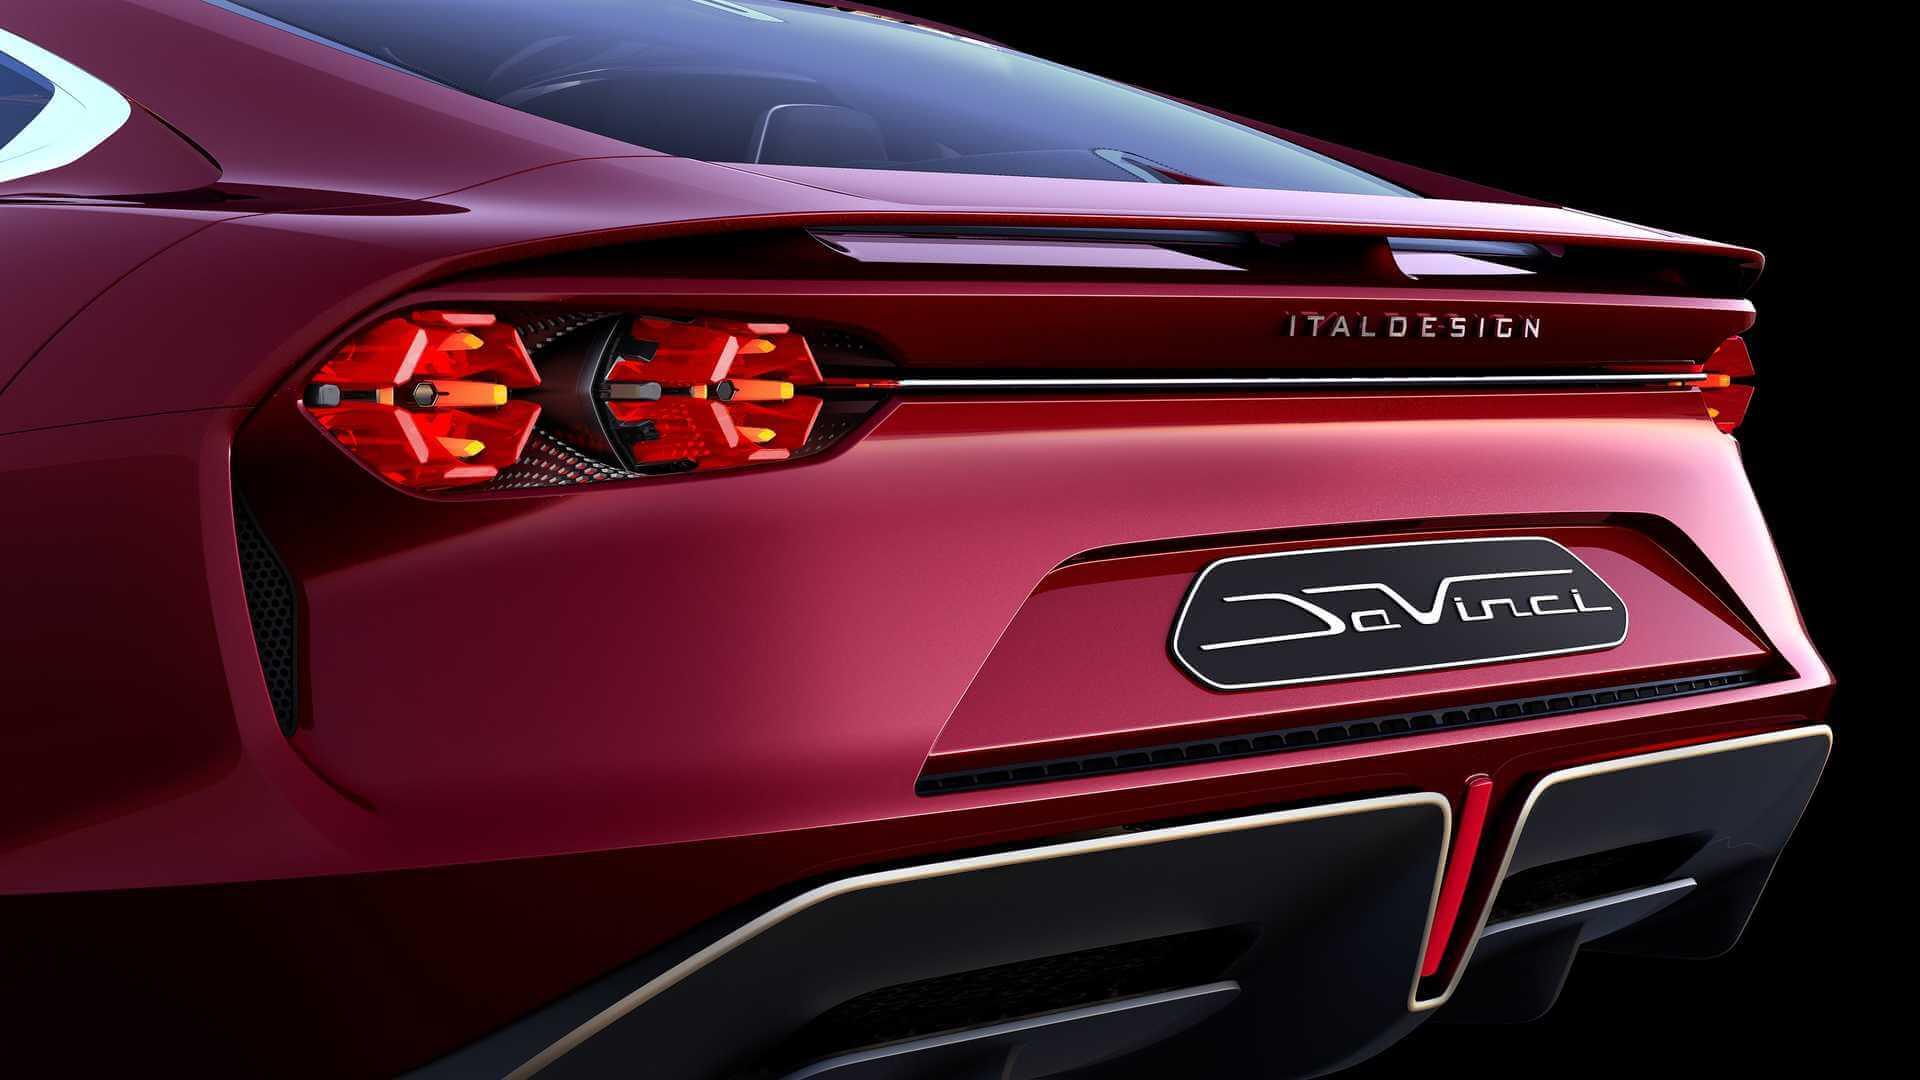 Концепт электромобиля DaVinci - фото 4